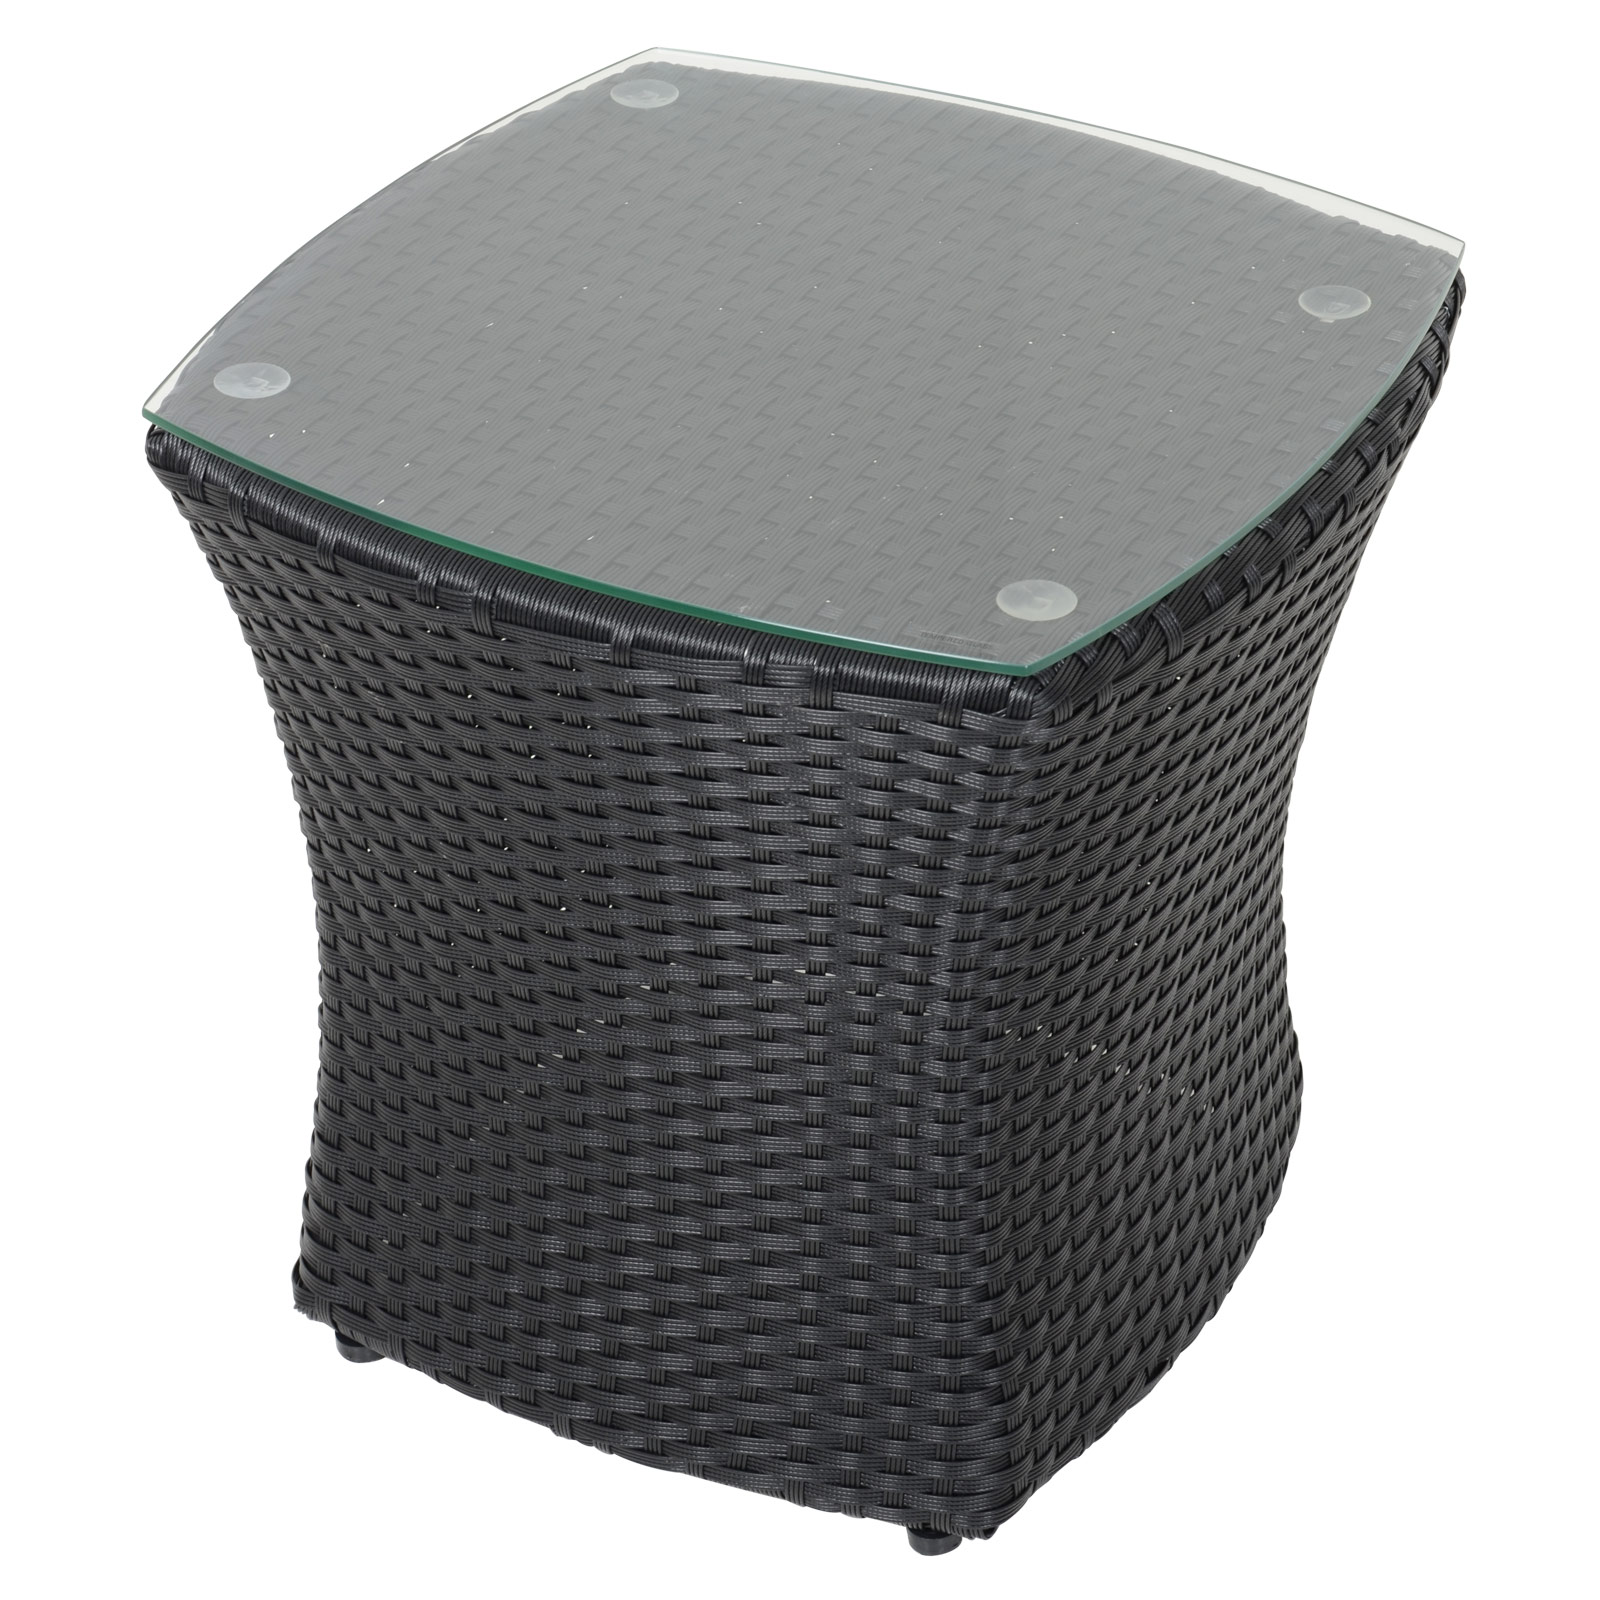 Lazio Black Bistro Set Coffee Table 2 Chairs Rattan Wicker Deck Garden Furniture Ebay